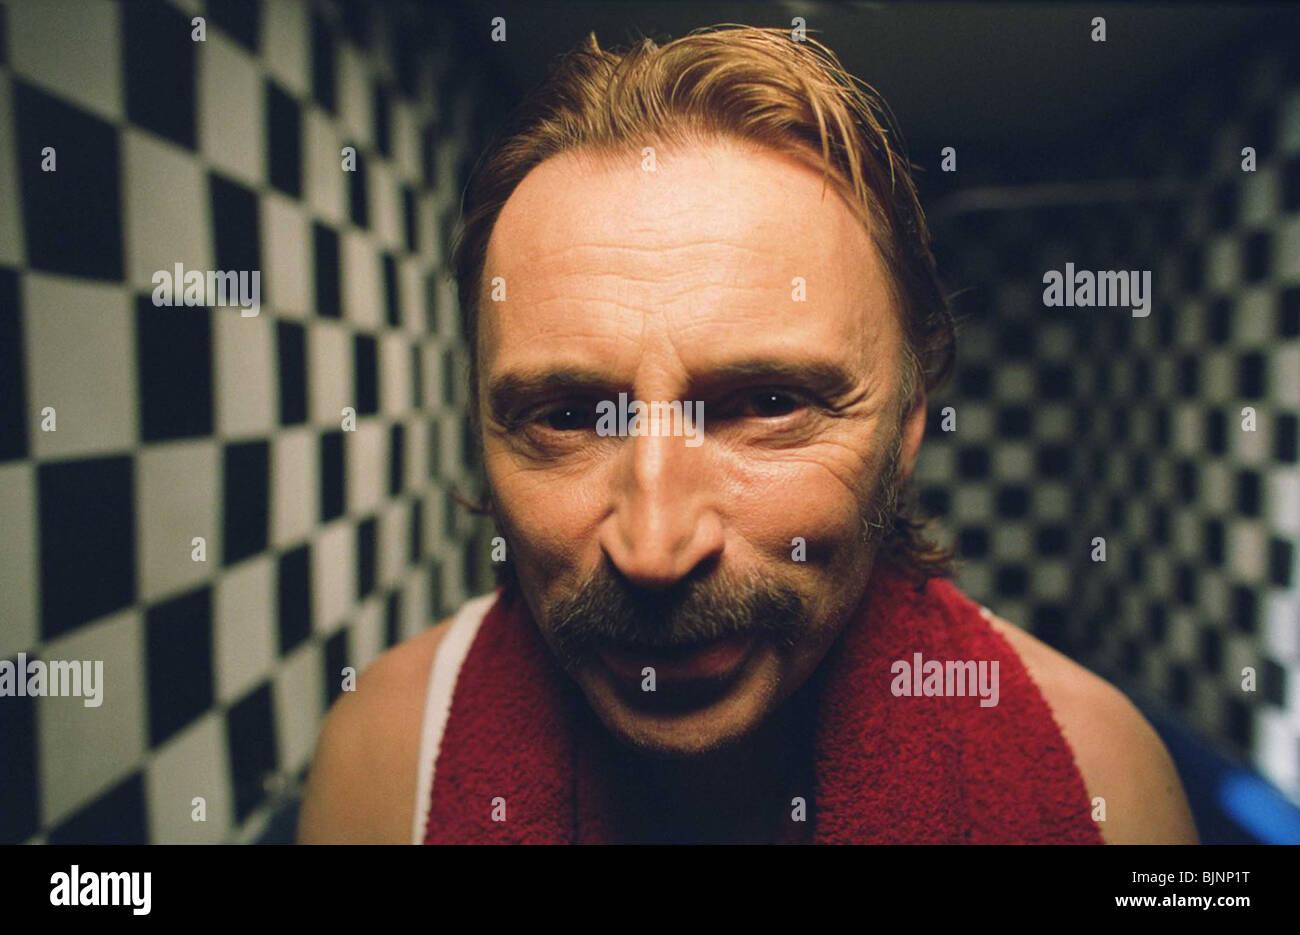 I KNOW YOU KNOW (2008) ROBERT CARLYLE JUSTIN KERRIGAN (DIR) 001 - Stock Image